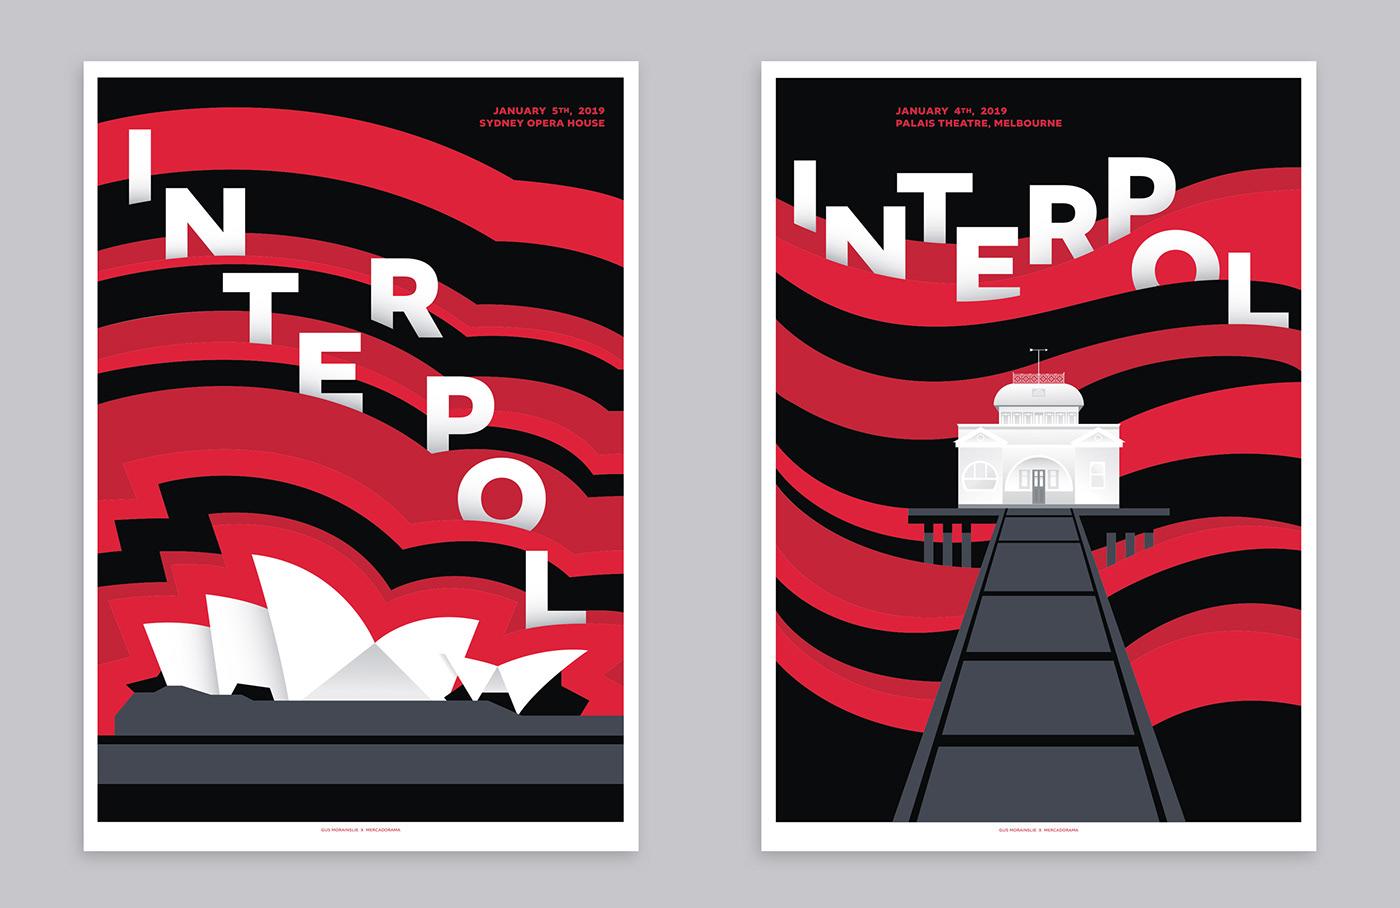 Australia GigPoster interpol Melbourne nyc Opera House poster screenprint sydney